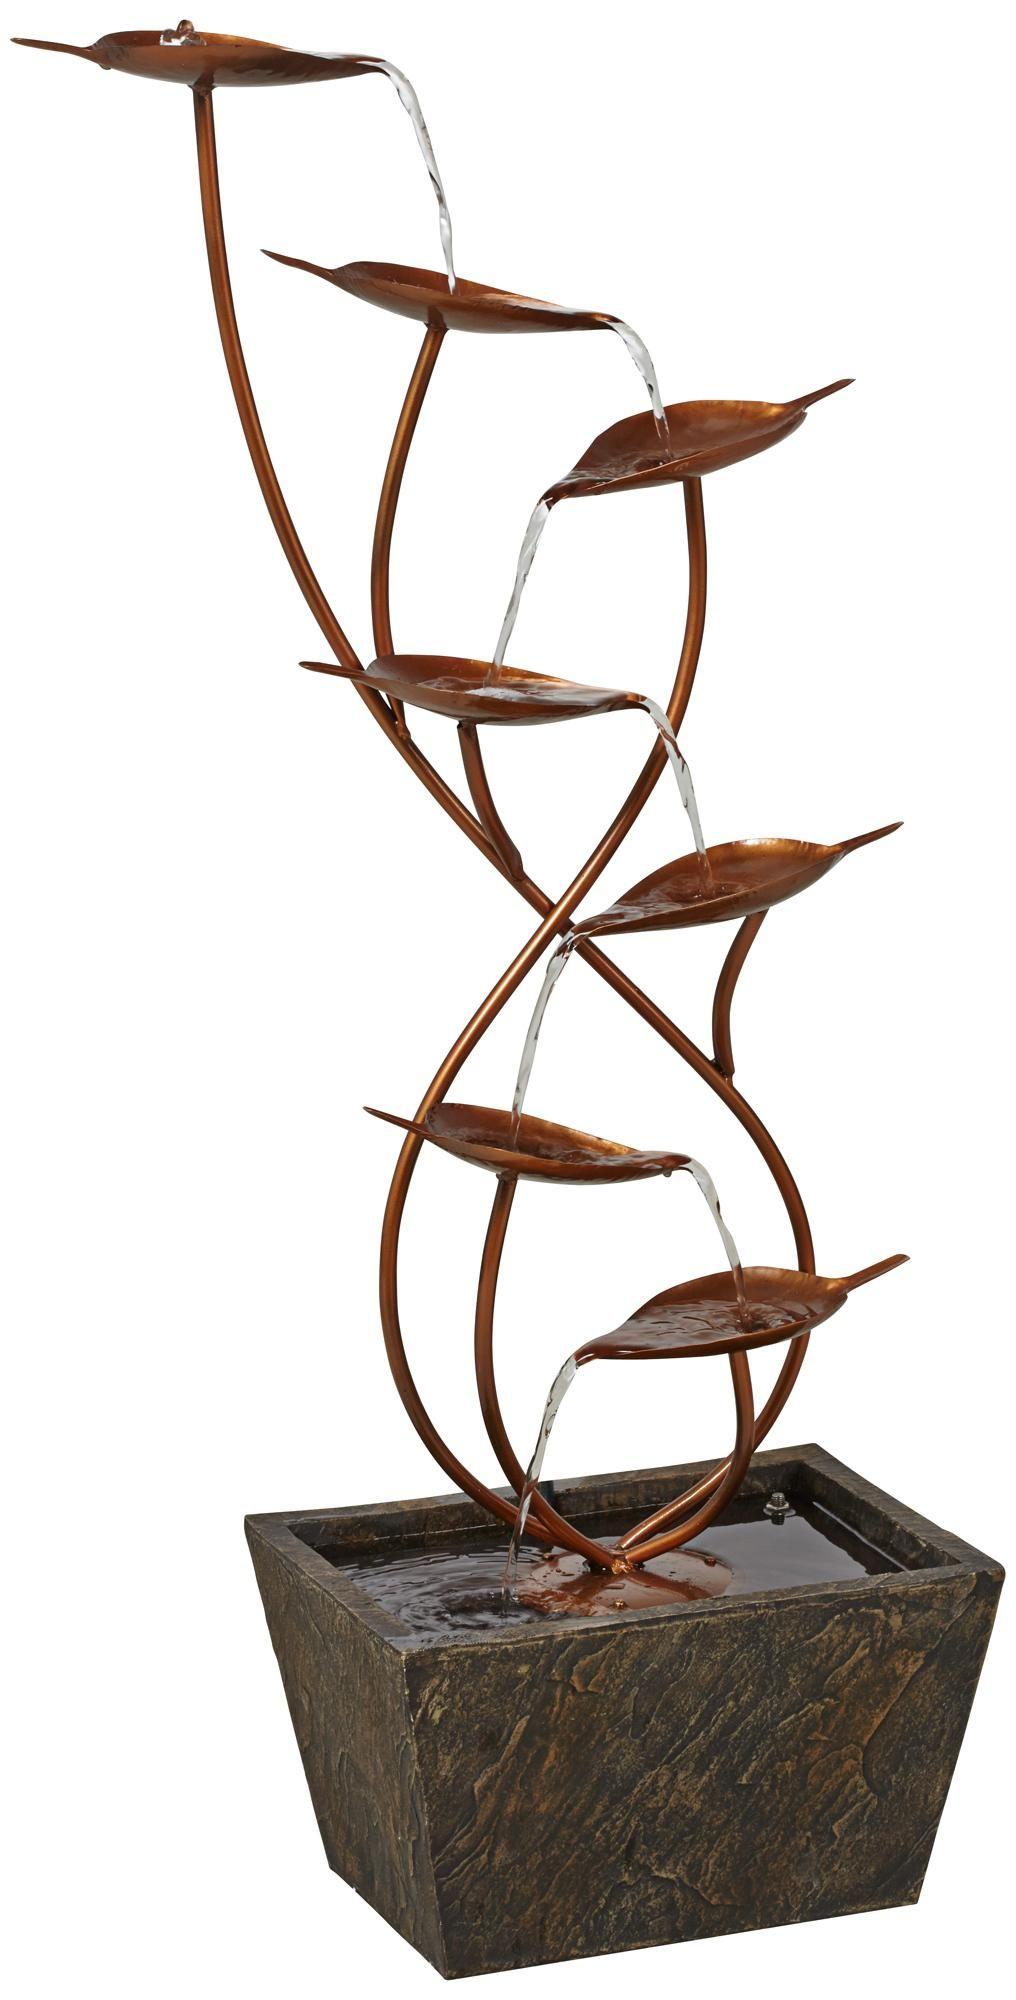 Ashton curved leaves 41 high copper finish floor fountain